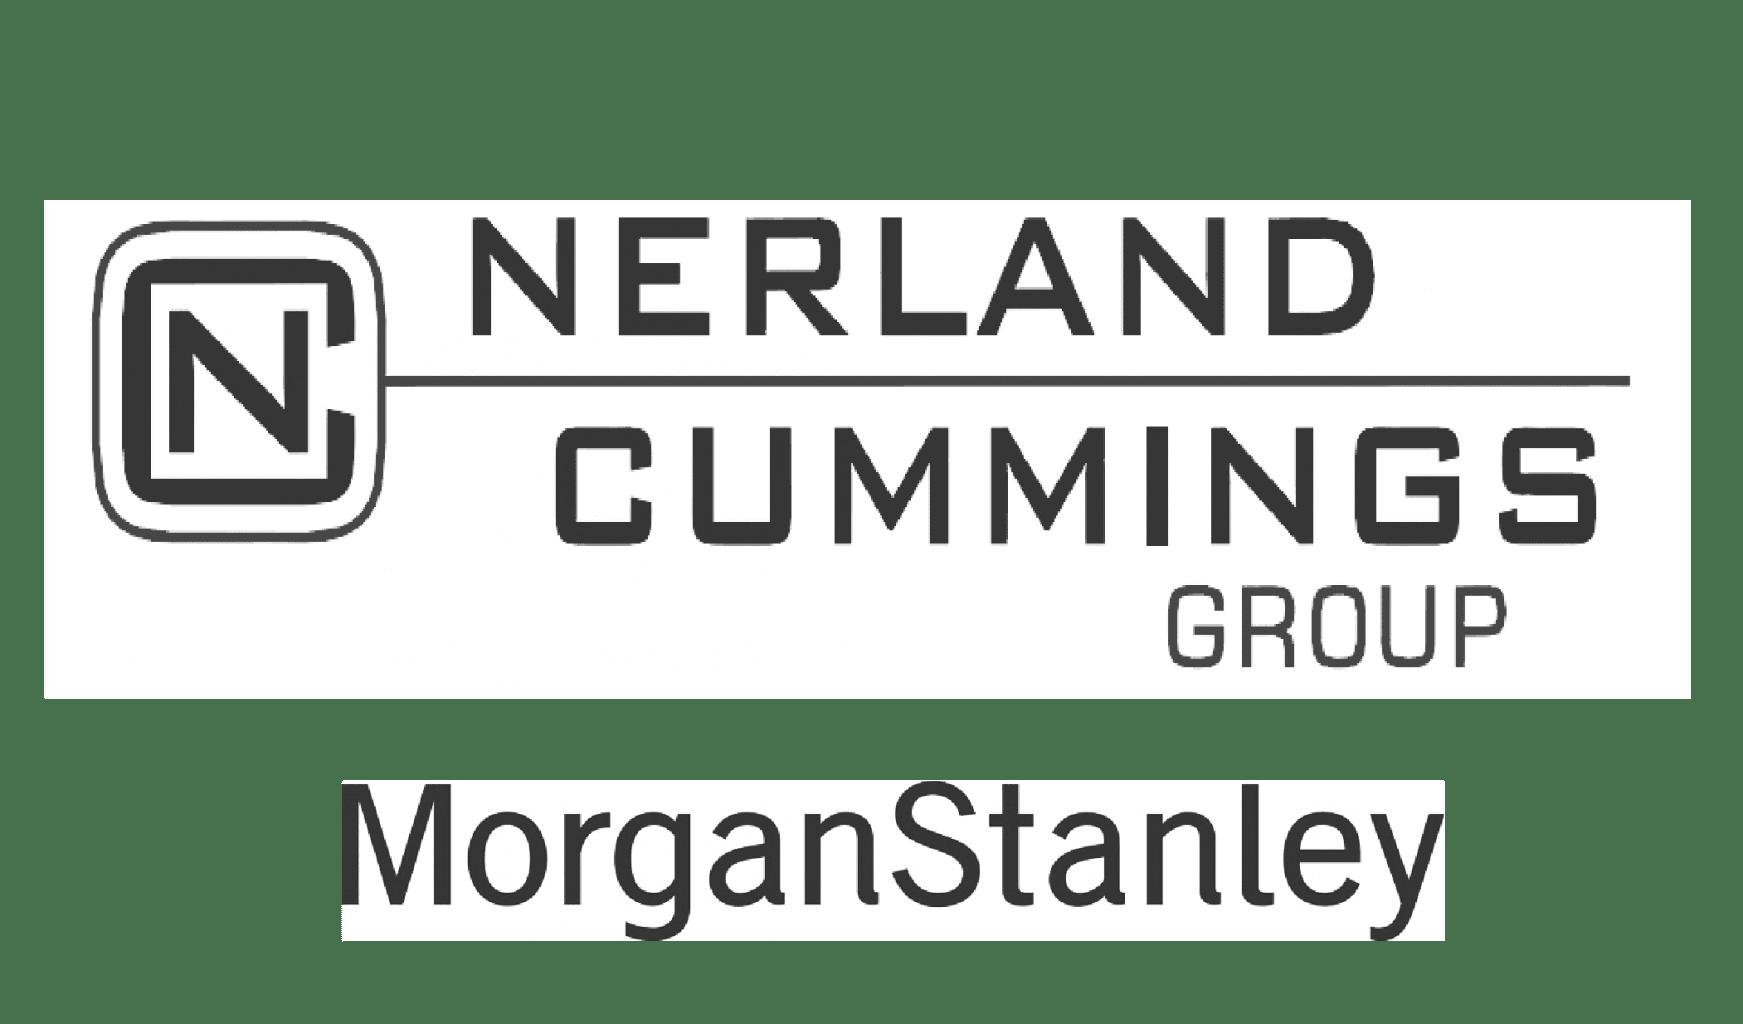 NCG at Morgan Stanley-01 B&W